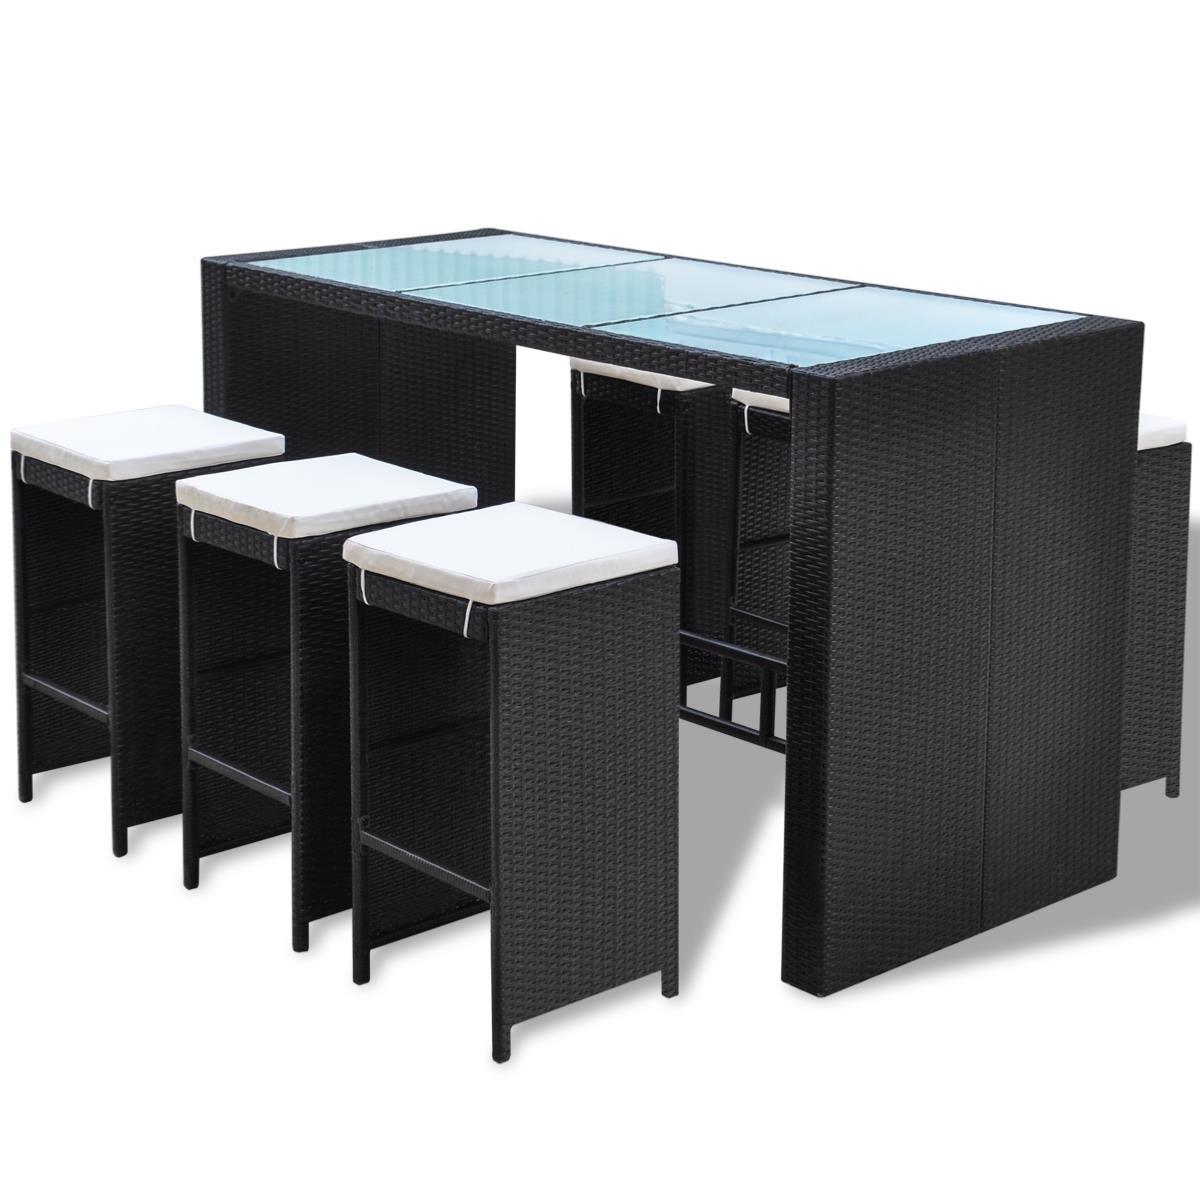 bar jardin r sine tress e noir 6 personnes mod le hawai. Black Bedroom Furniture Sets. Home Design Ideas